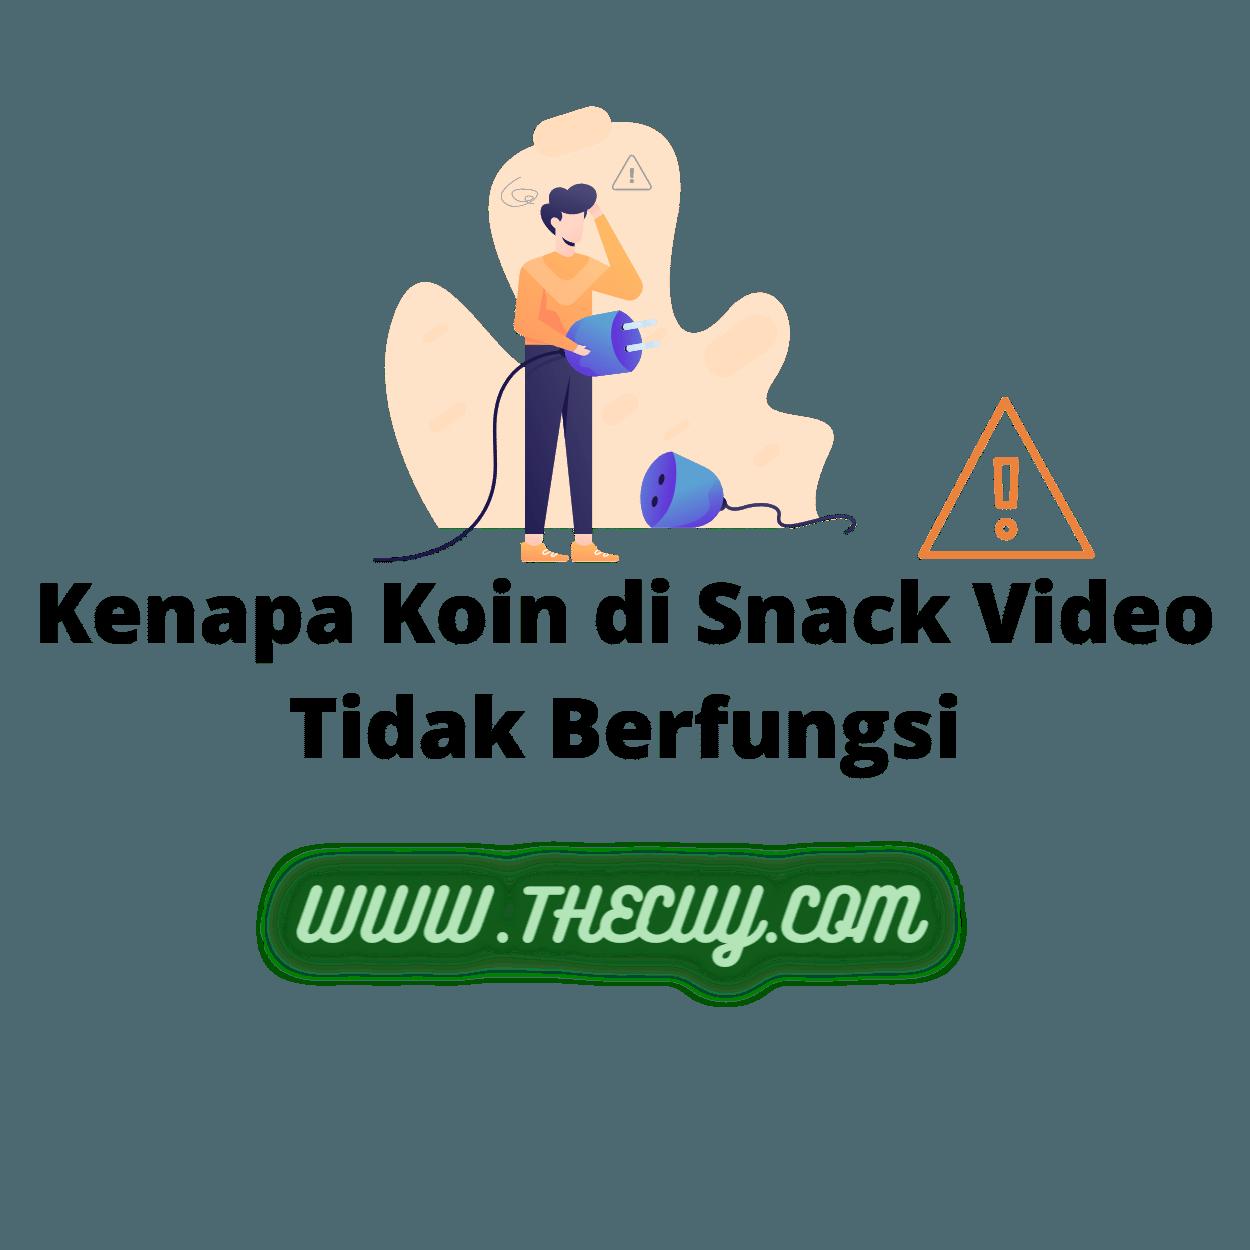 Kenapa Koin di Snack Video Tidak Berfungsi